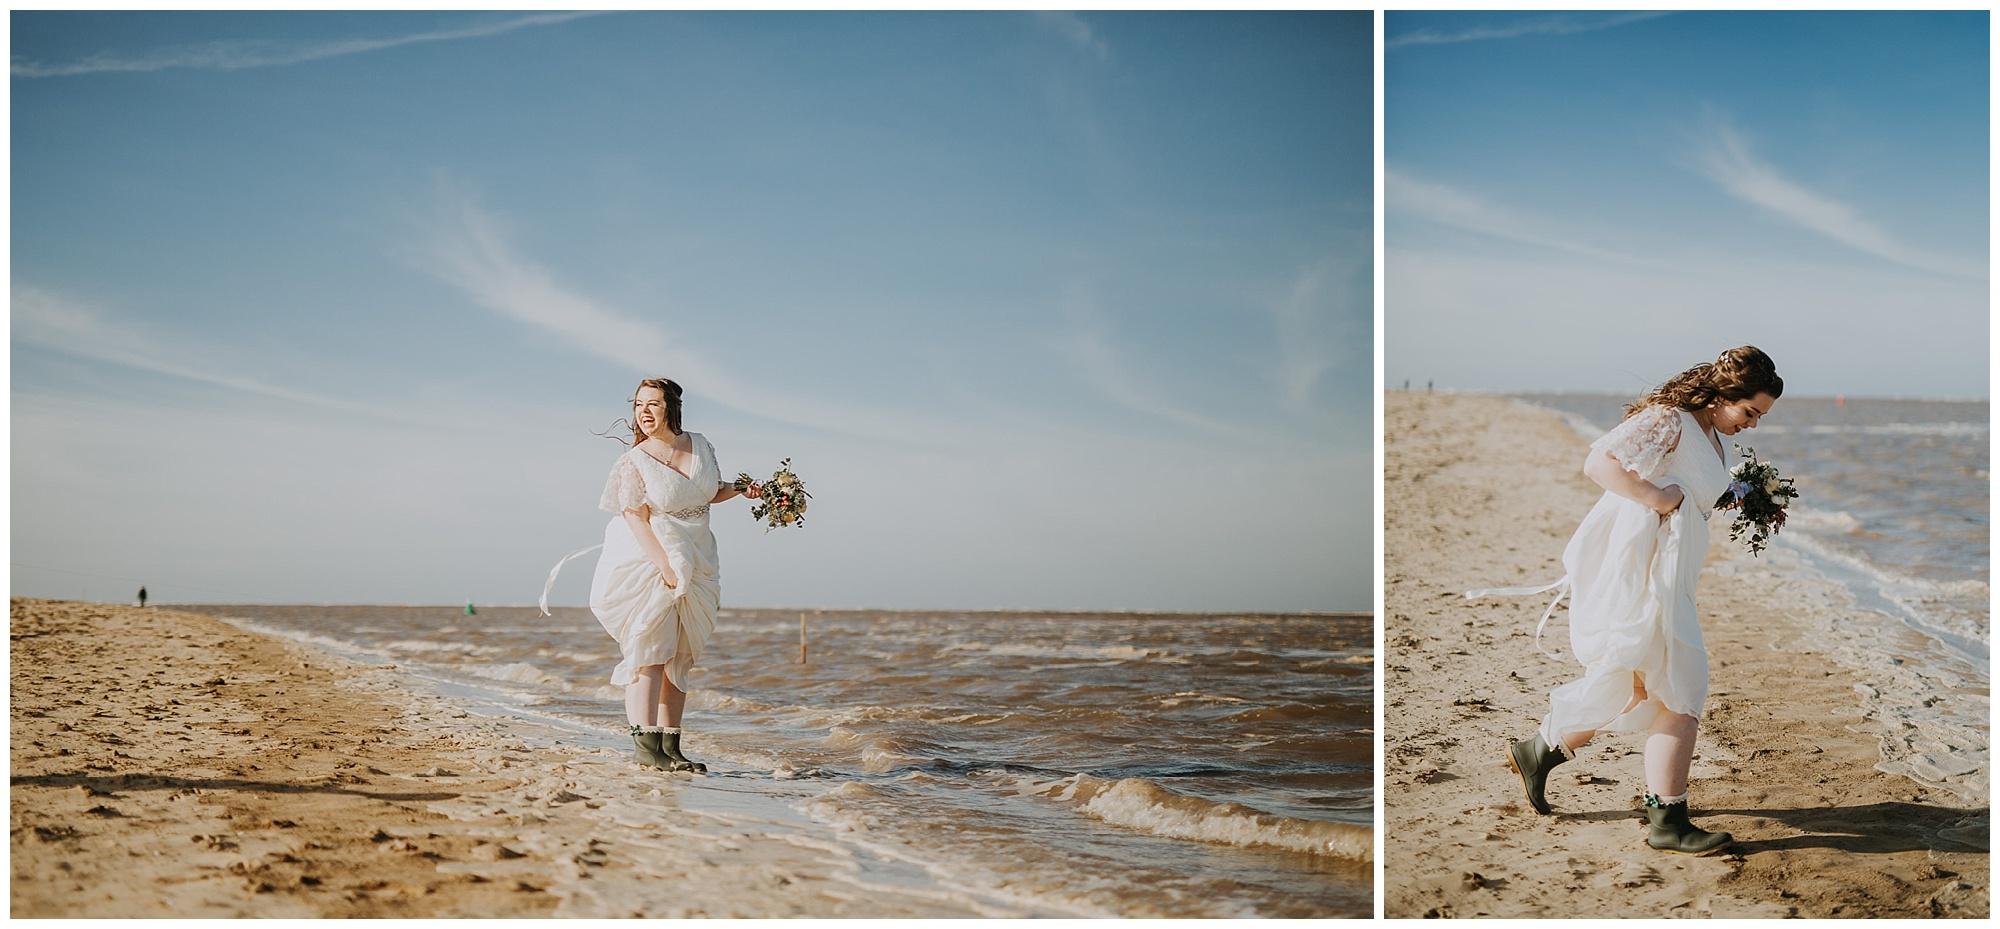 bride paddles in sea in wellies